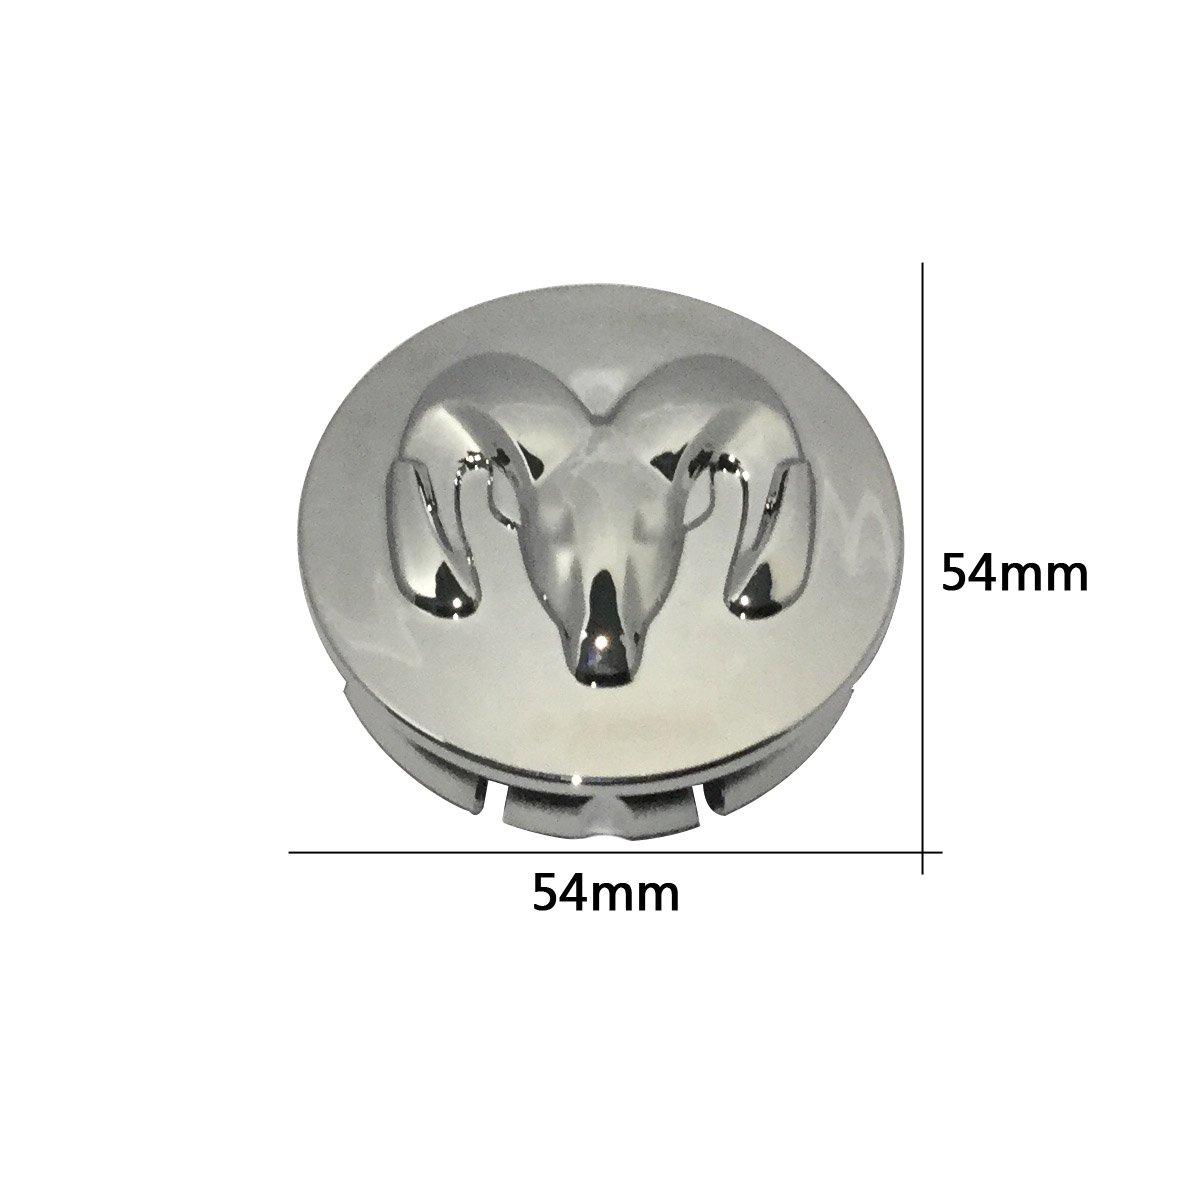 New 1pcs Dodge Keychain Lanyard Badge Holder 4pcs set 54mm Wheel Center Caps Fit For Dodge